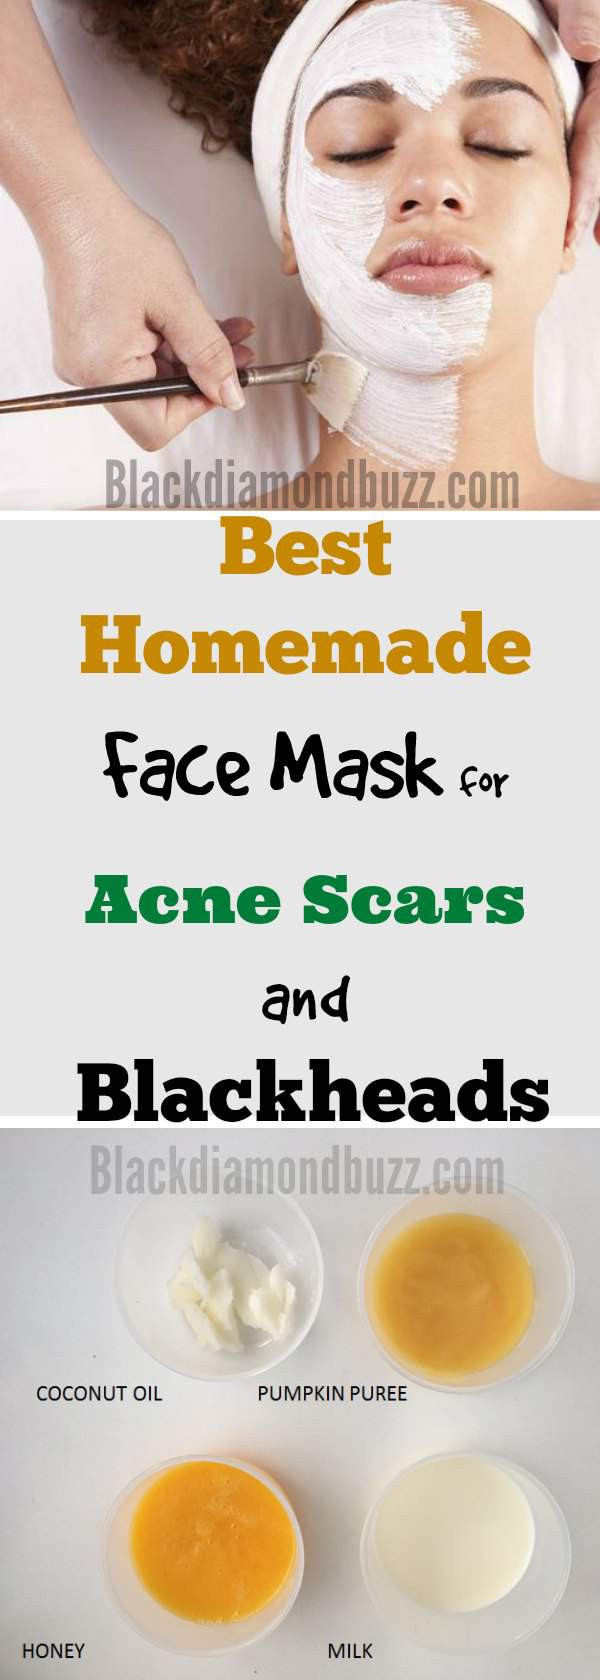 DIY Face Mask For Acne Scars  DIY Face Mask for Acne 7 Best Homemade Face Masks